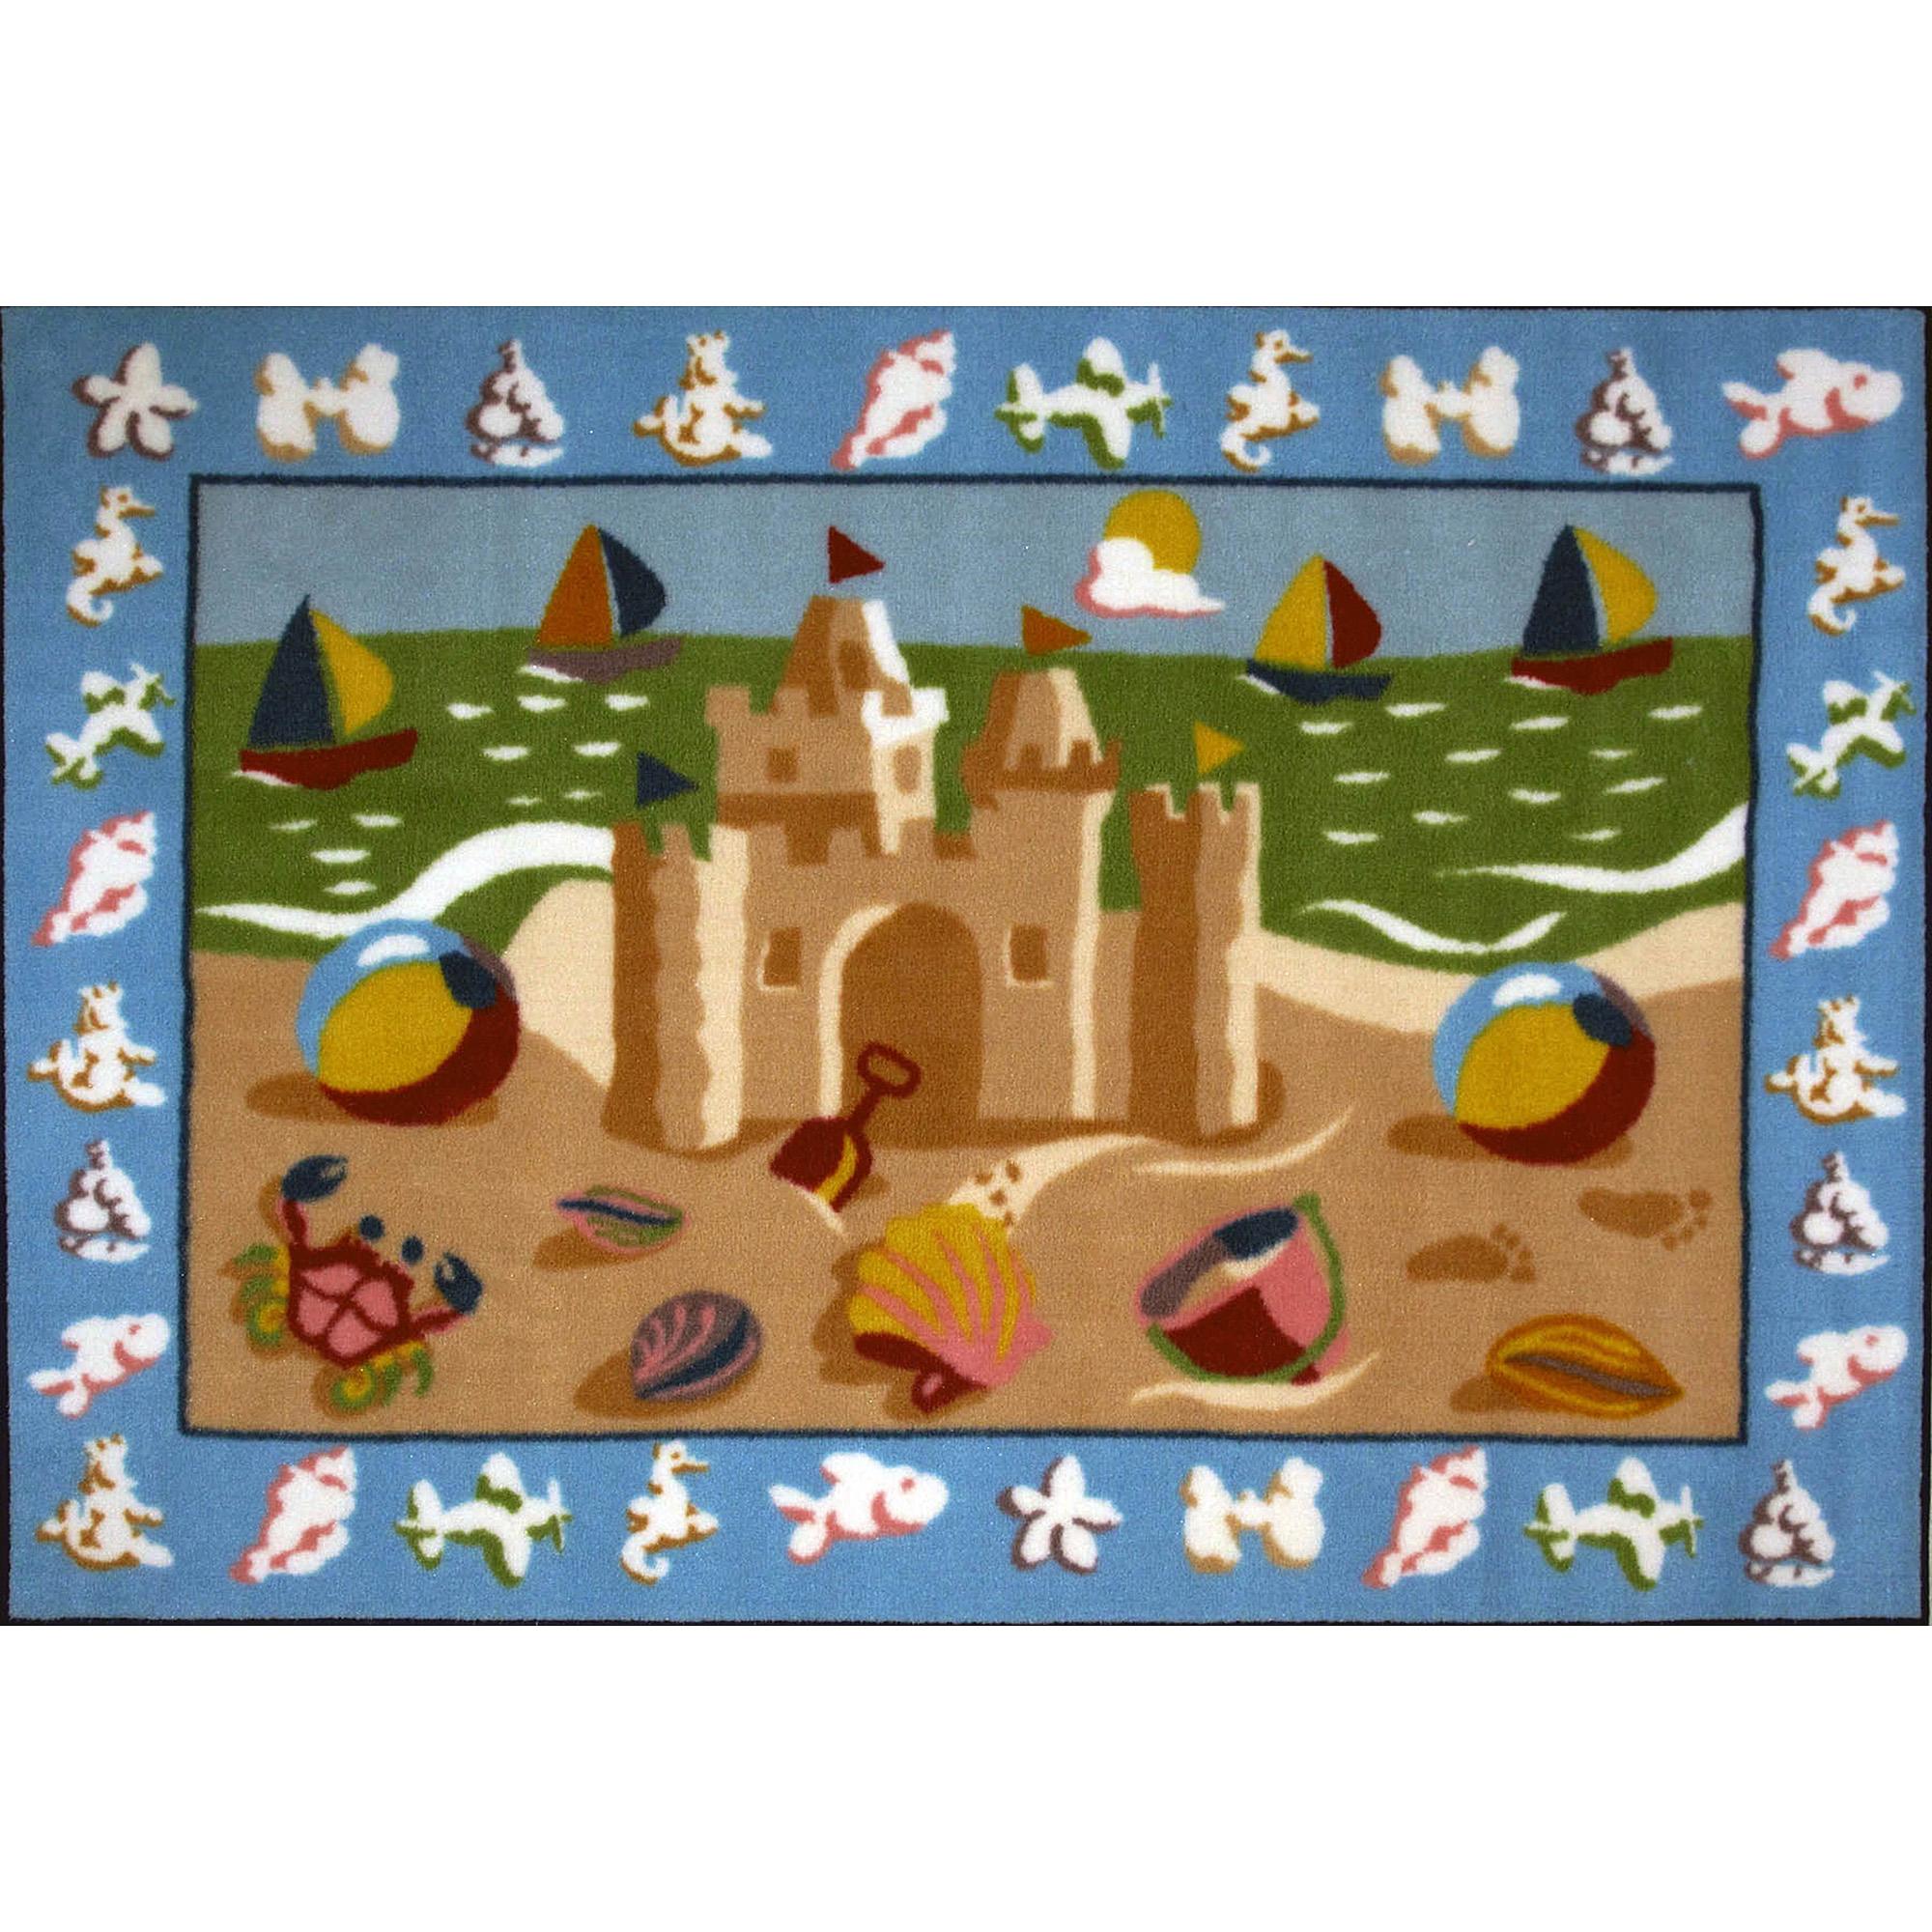 Fun Rugs Olive Kids Sand Castle Rug